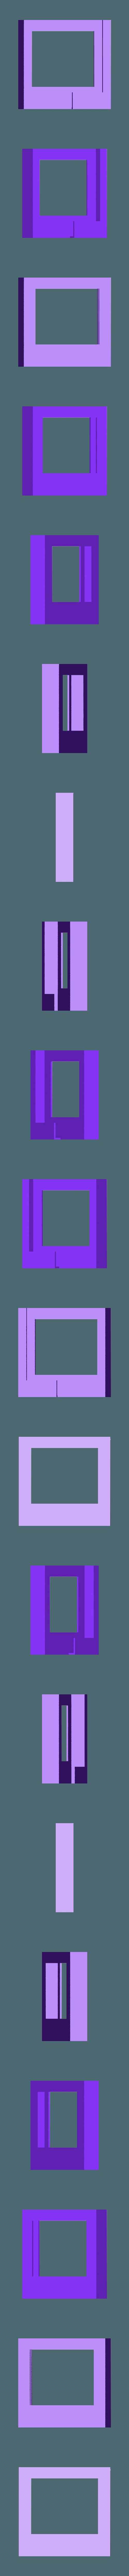 mobileholder.stl Download free STL file MobileHolder • 3D printer design, jankitokarczew